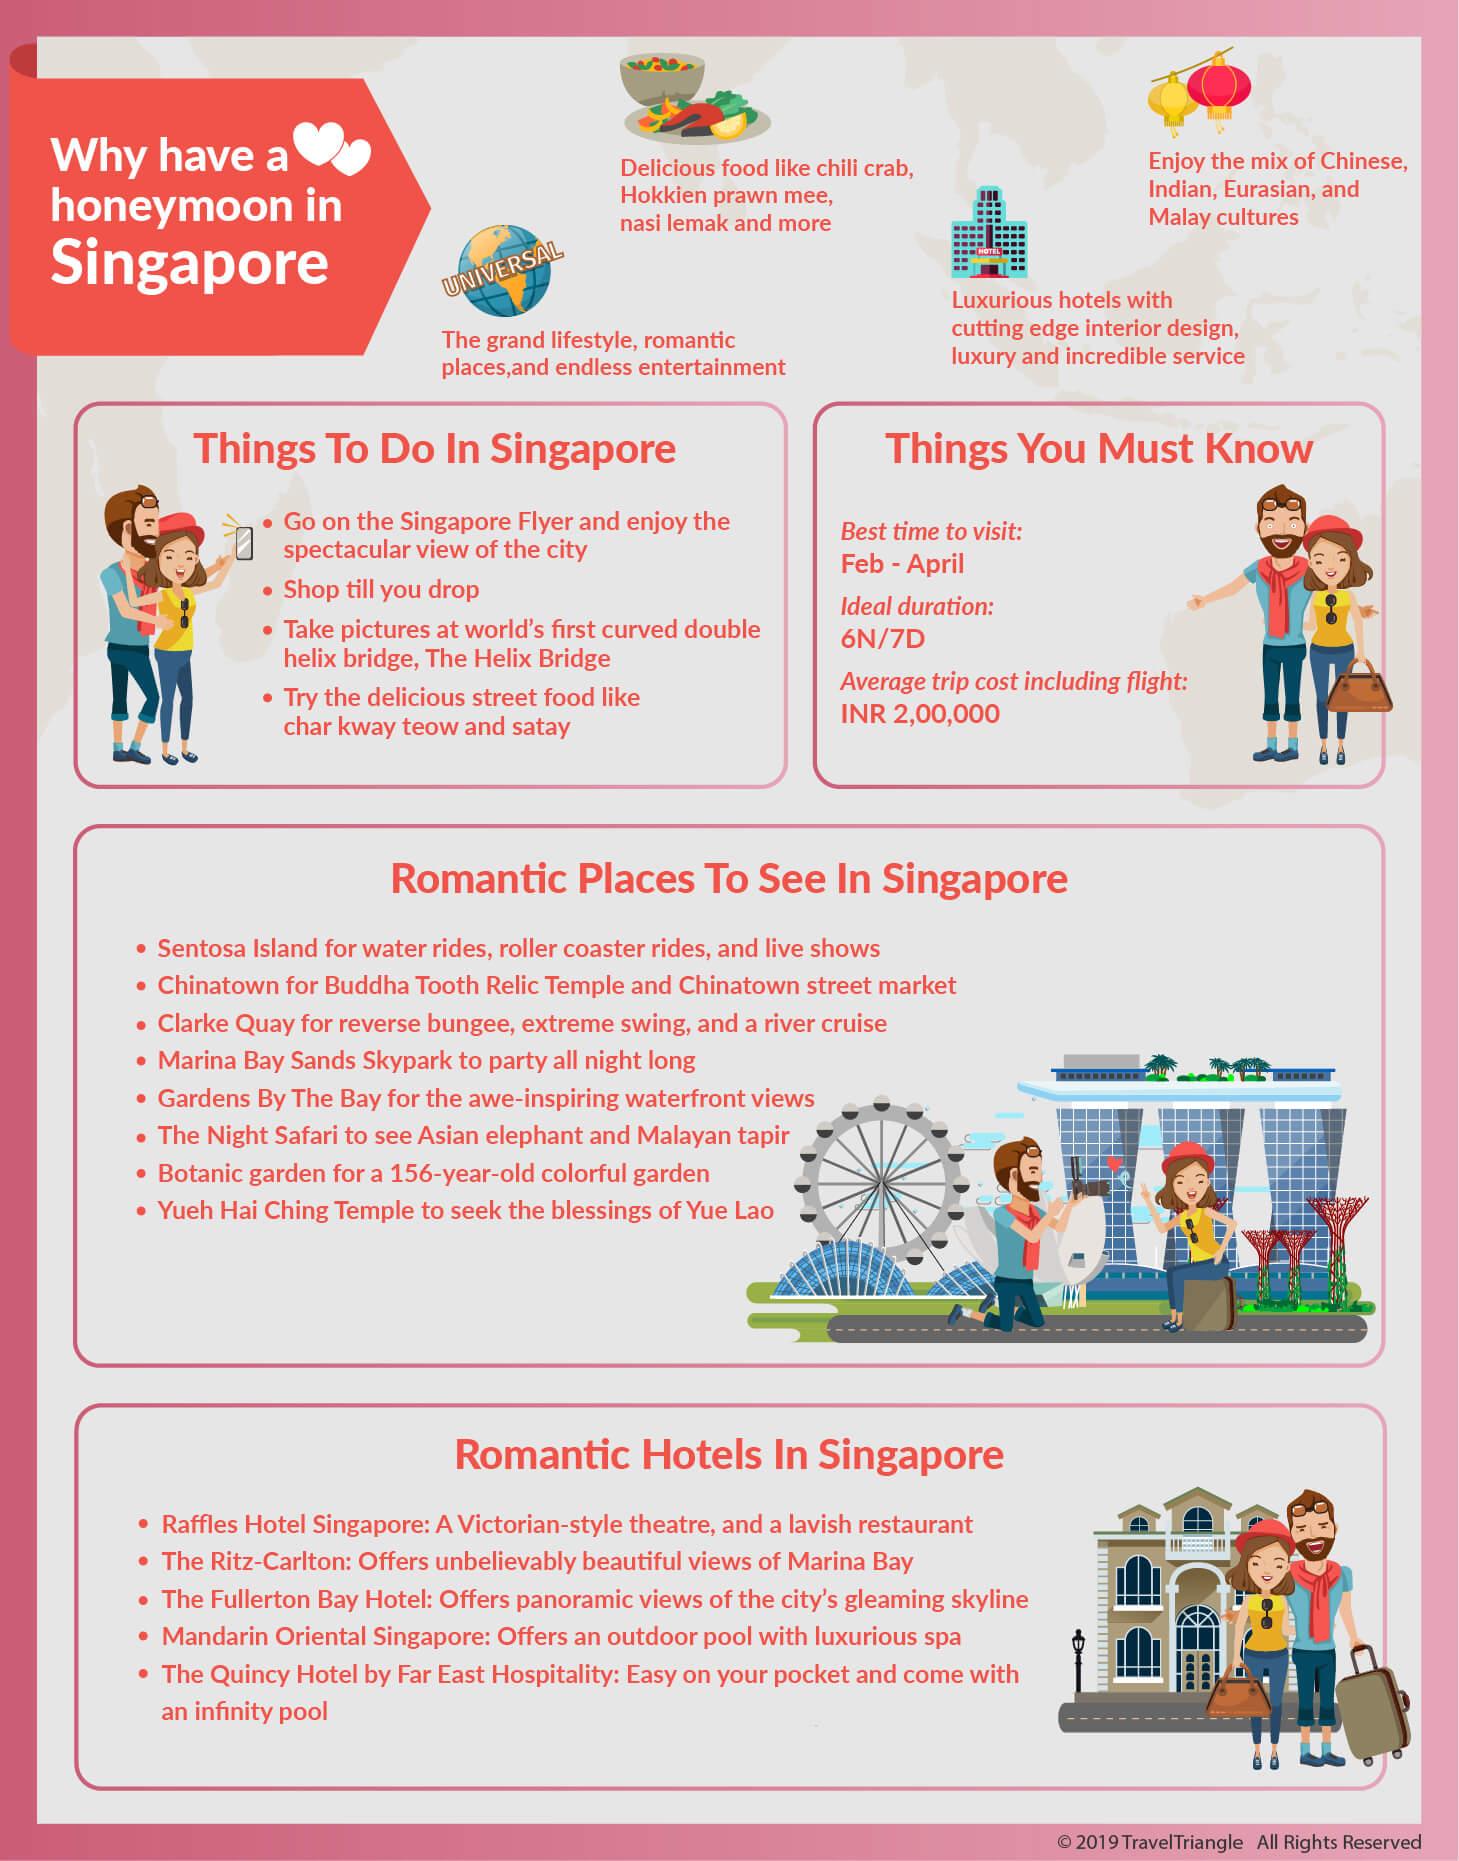 Honeymoon In Singapore Infographic